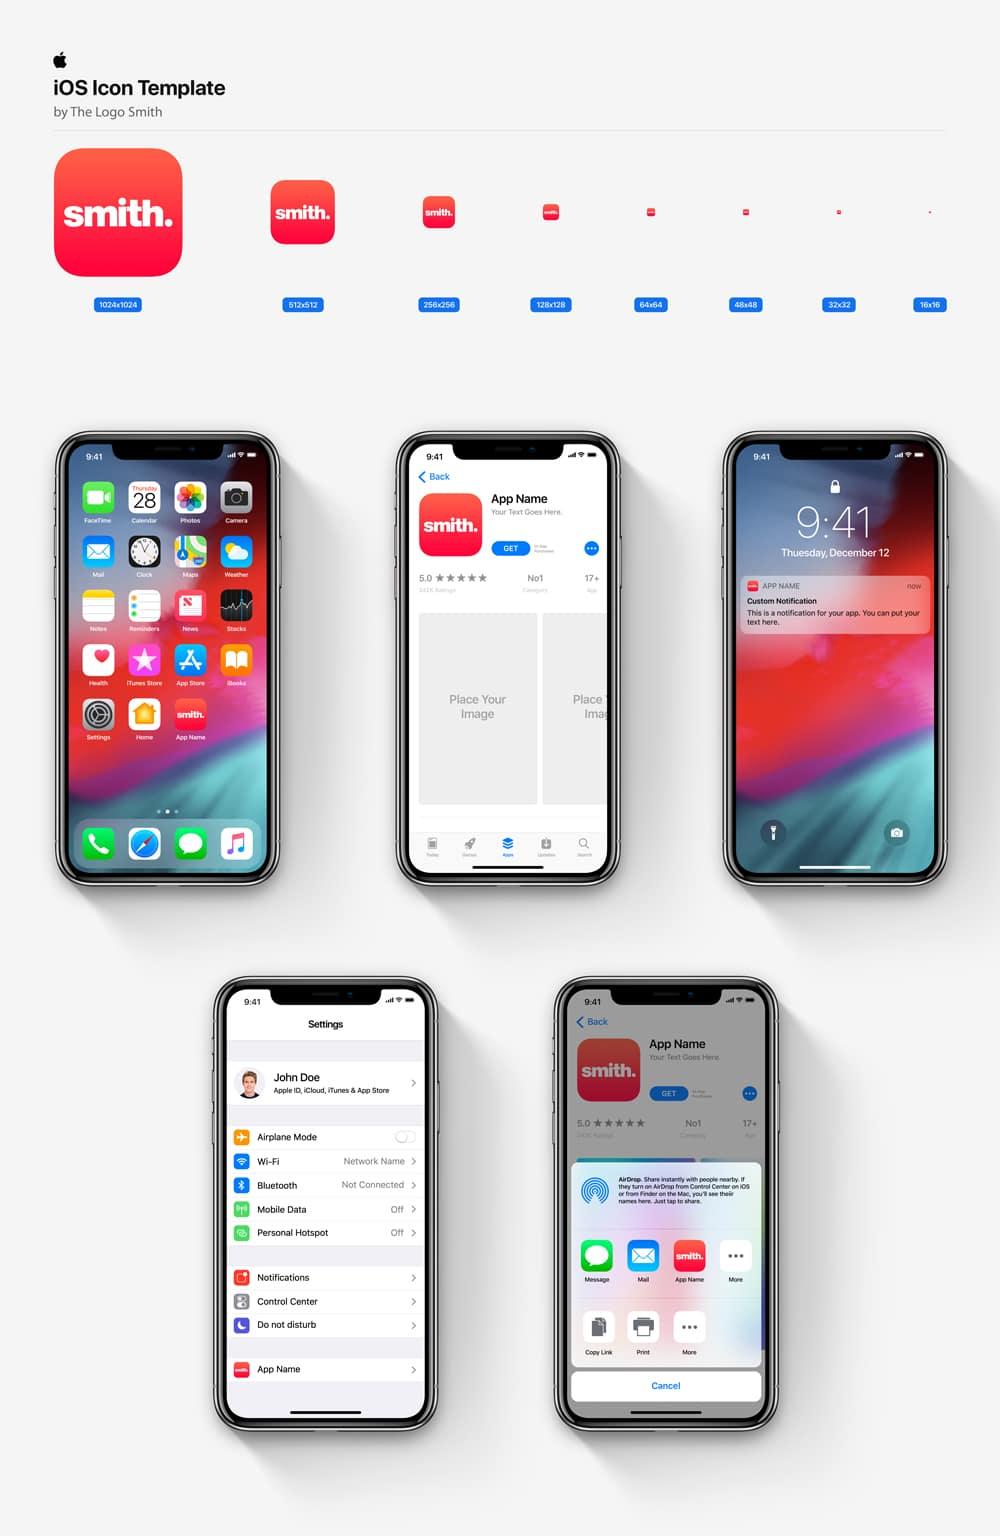 iOS Icon Template Mockup The Logo Smith Freelance Brand Designer